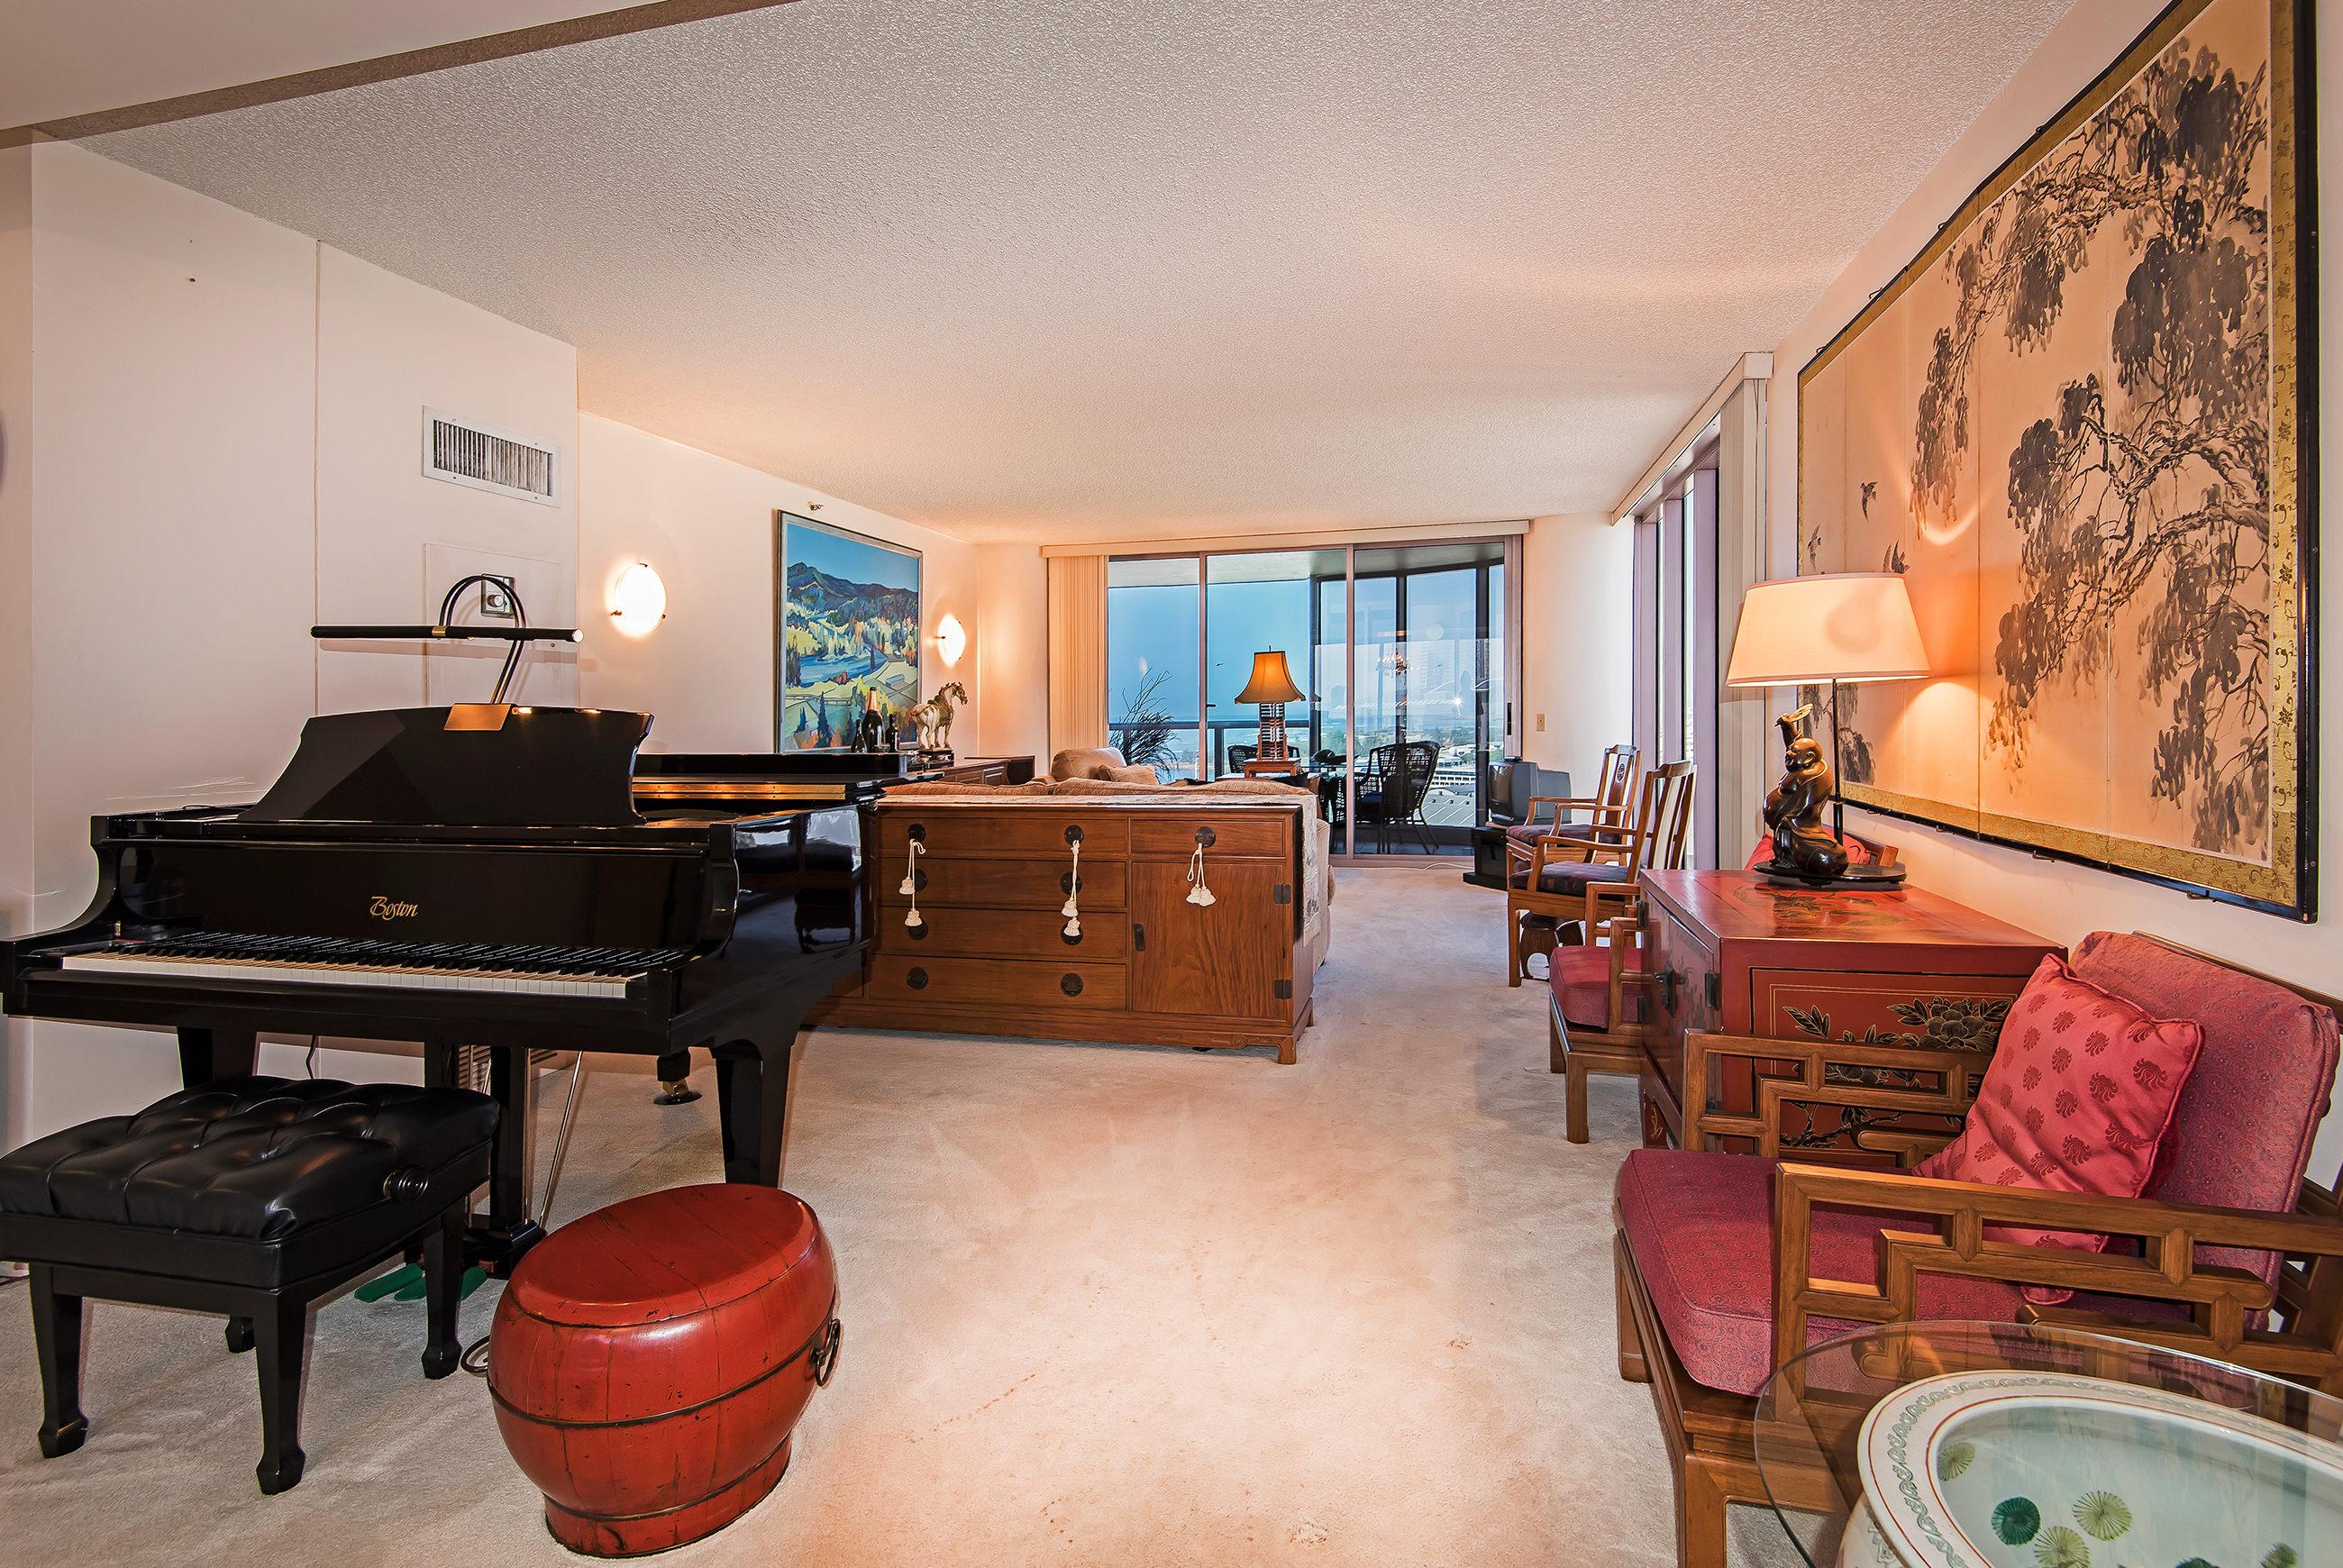 Condominium for Sale at Exceptional Honolulu Lifestyle 425 South Street #1904 Kakaako, Honolulu, Hawaii, 96813 United States